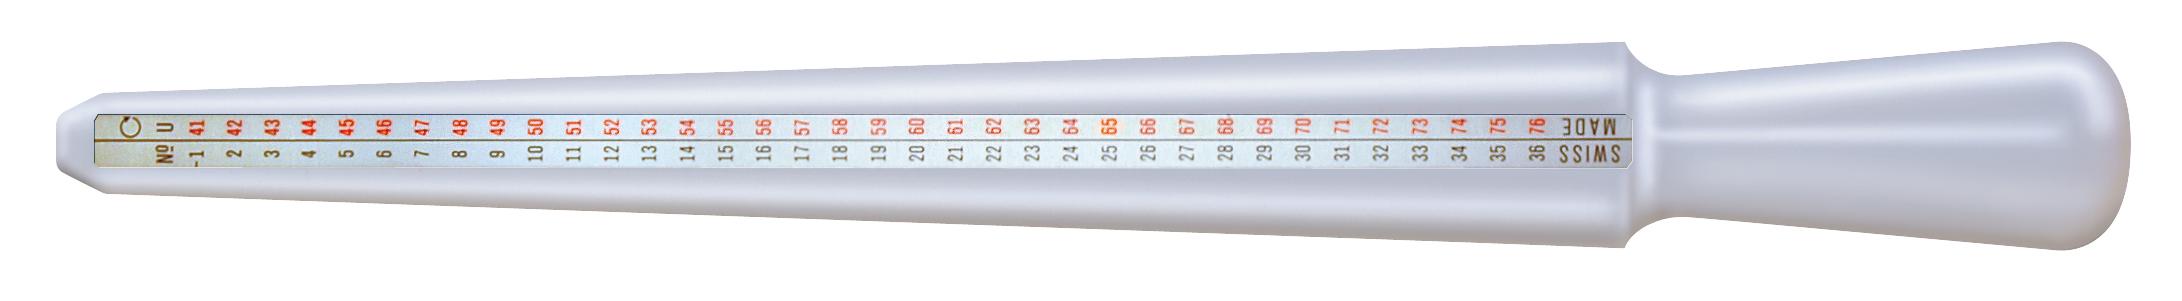 Ringstock aus Delrin-Kunststoff weiß Bergeon